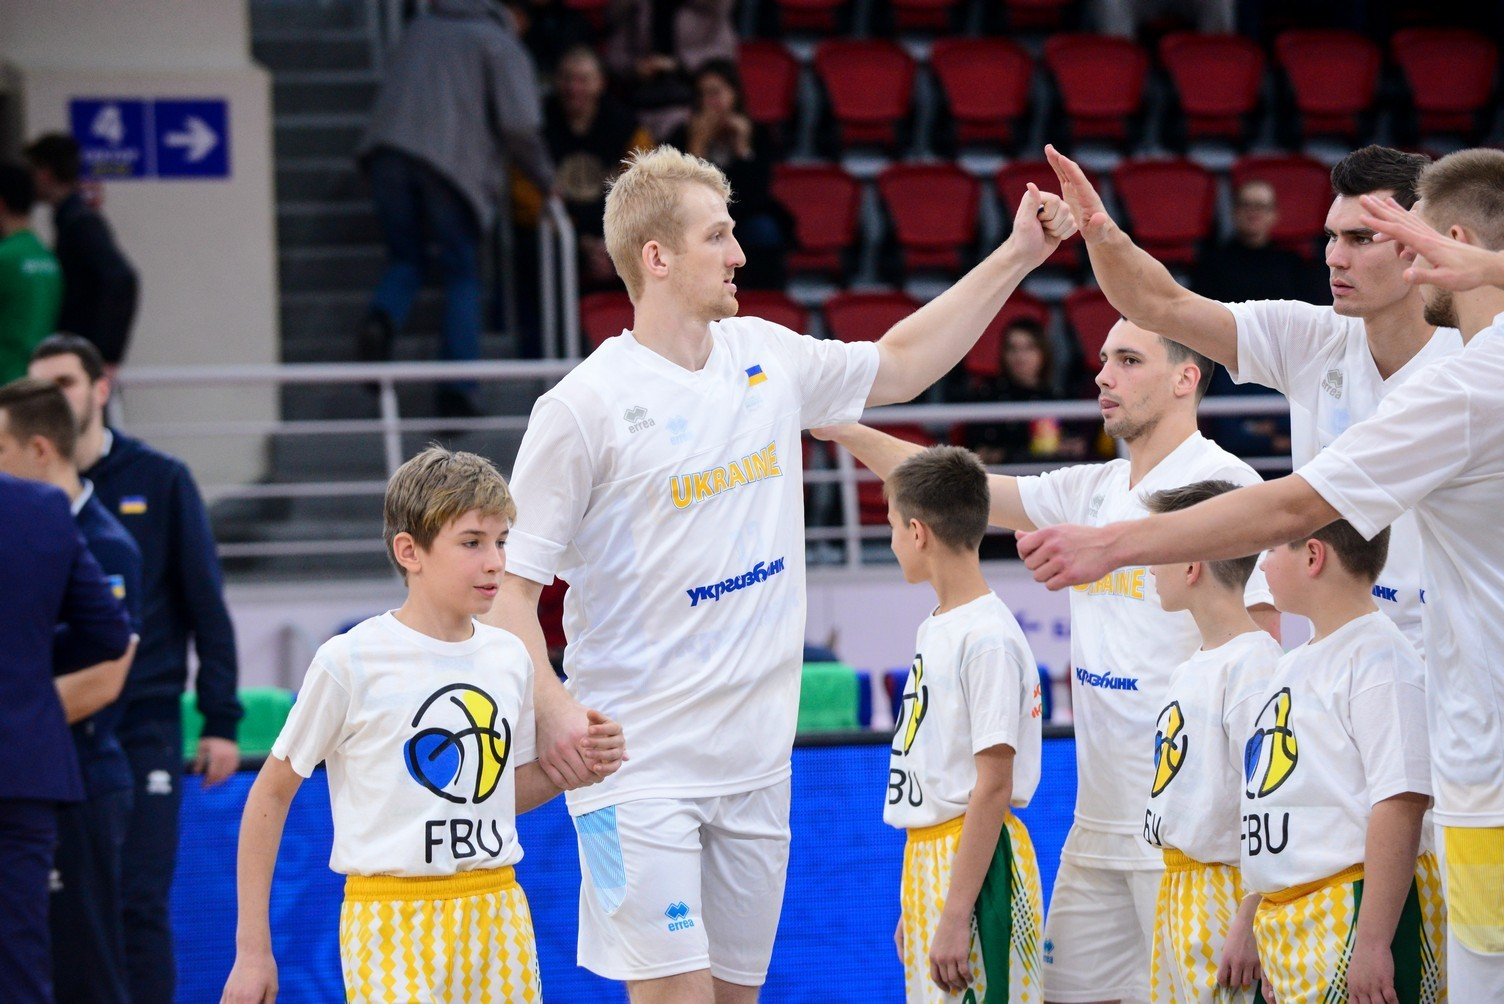 Іспанія - Україна: анонс матчу кваліфікації чемпіонату світу